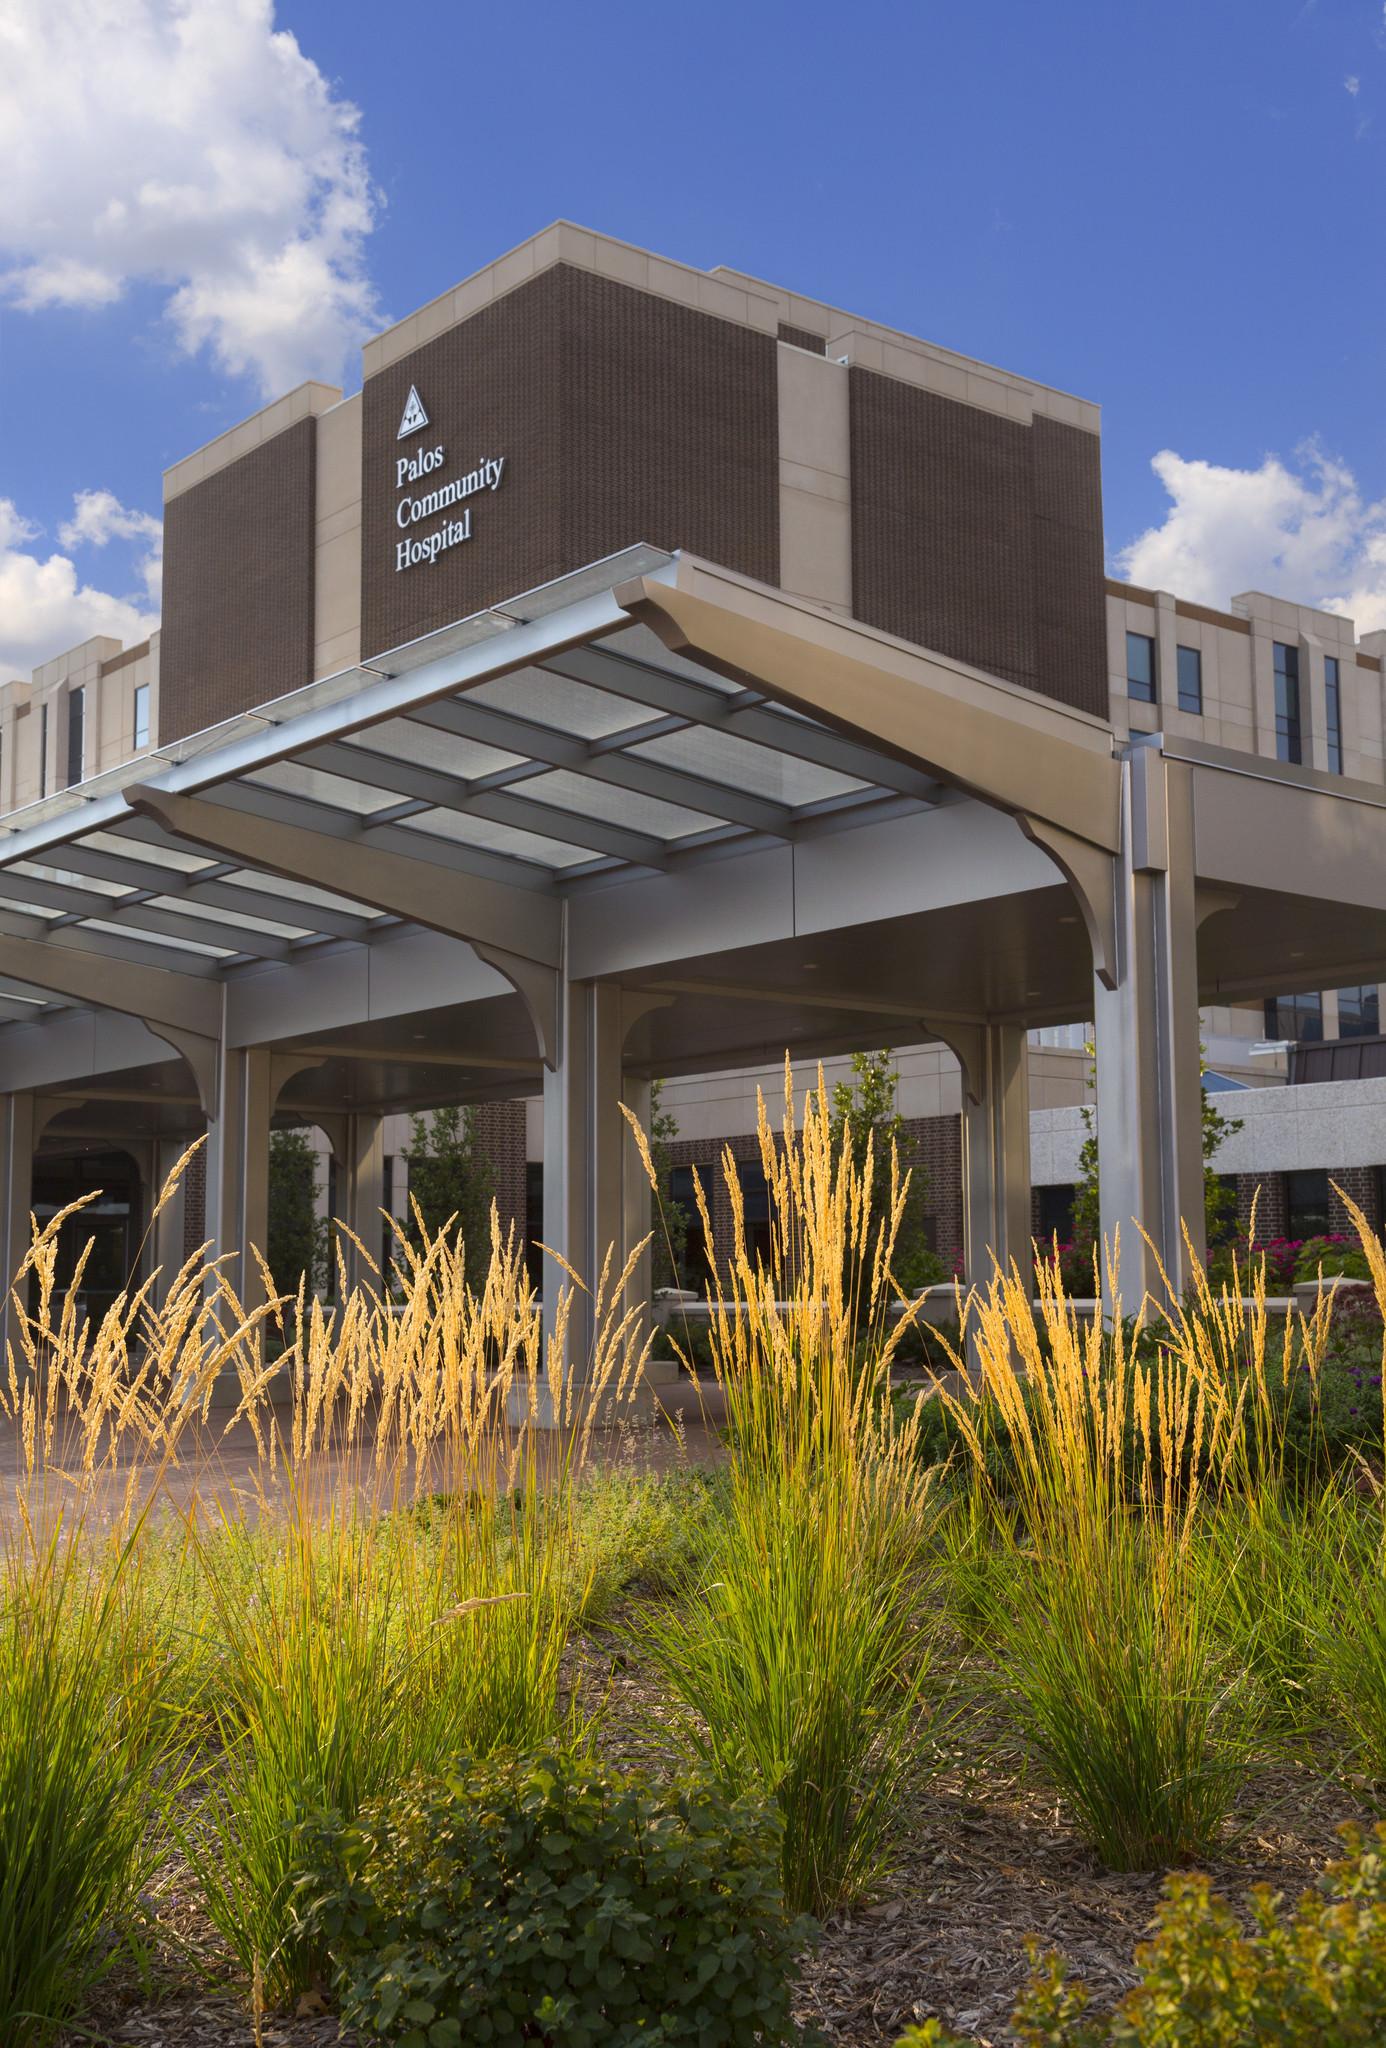 Healthgrades 50 Best Hospitals 2016: Healthgrades Names Palos Community Hospital One Of America